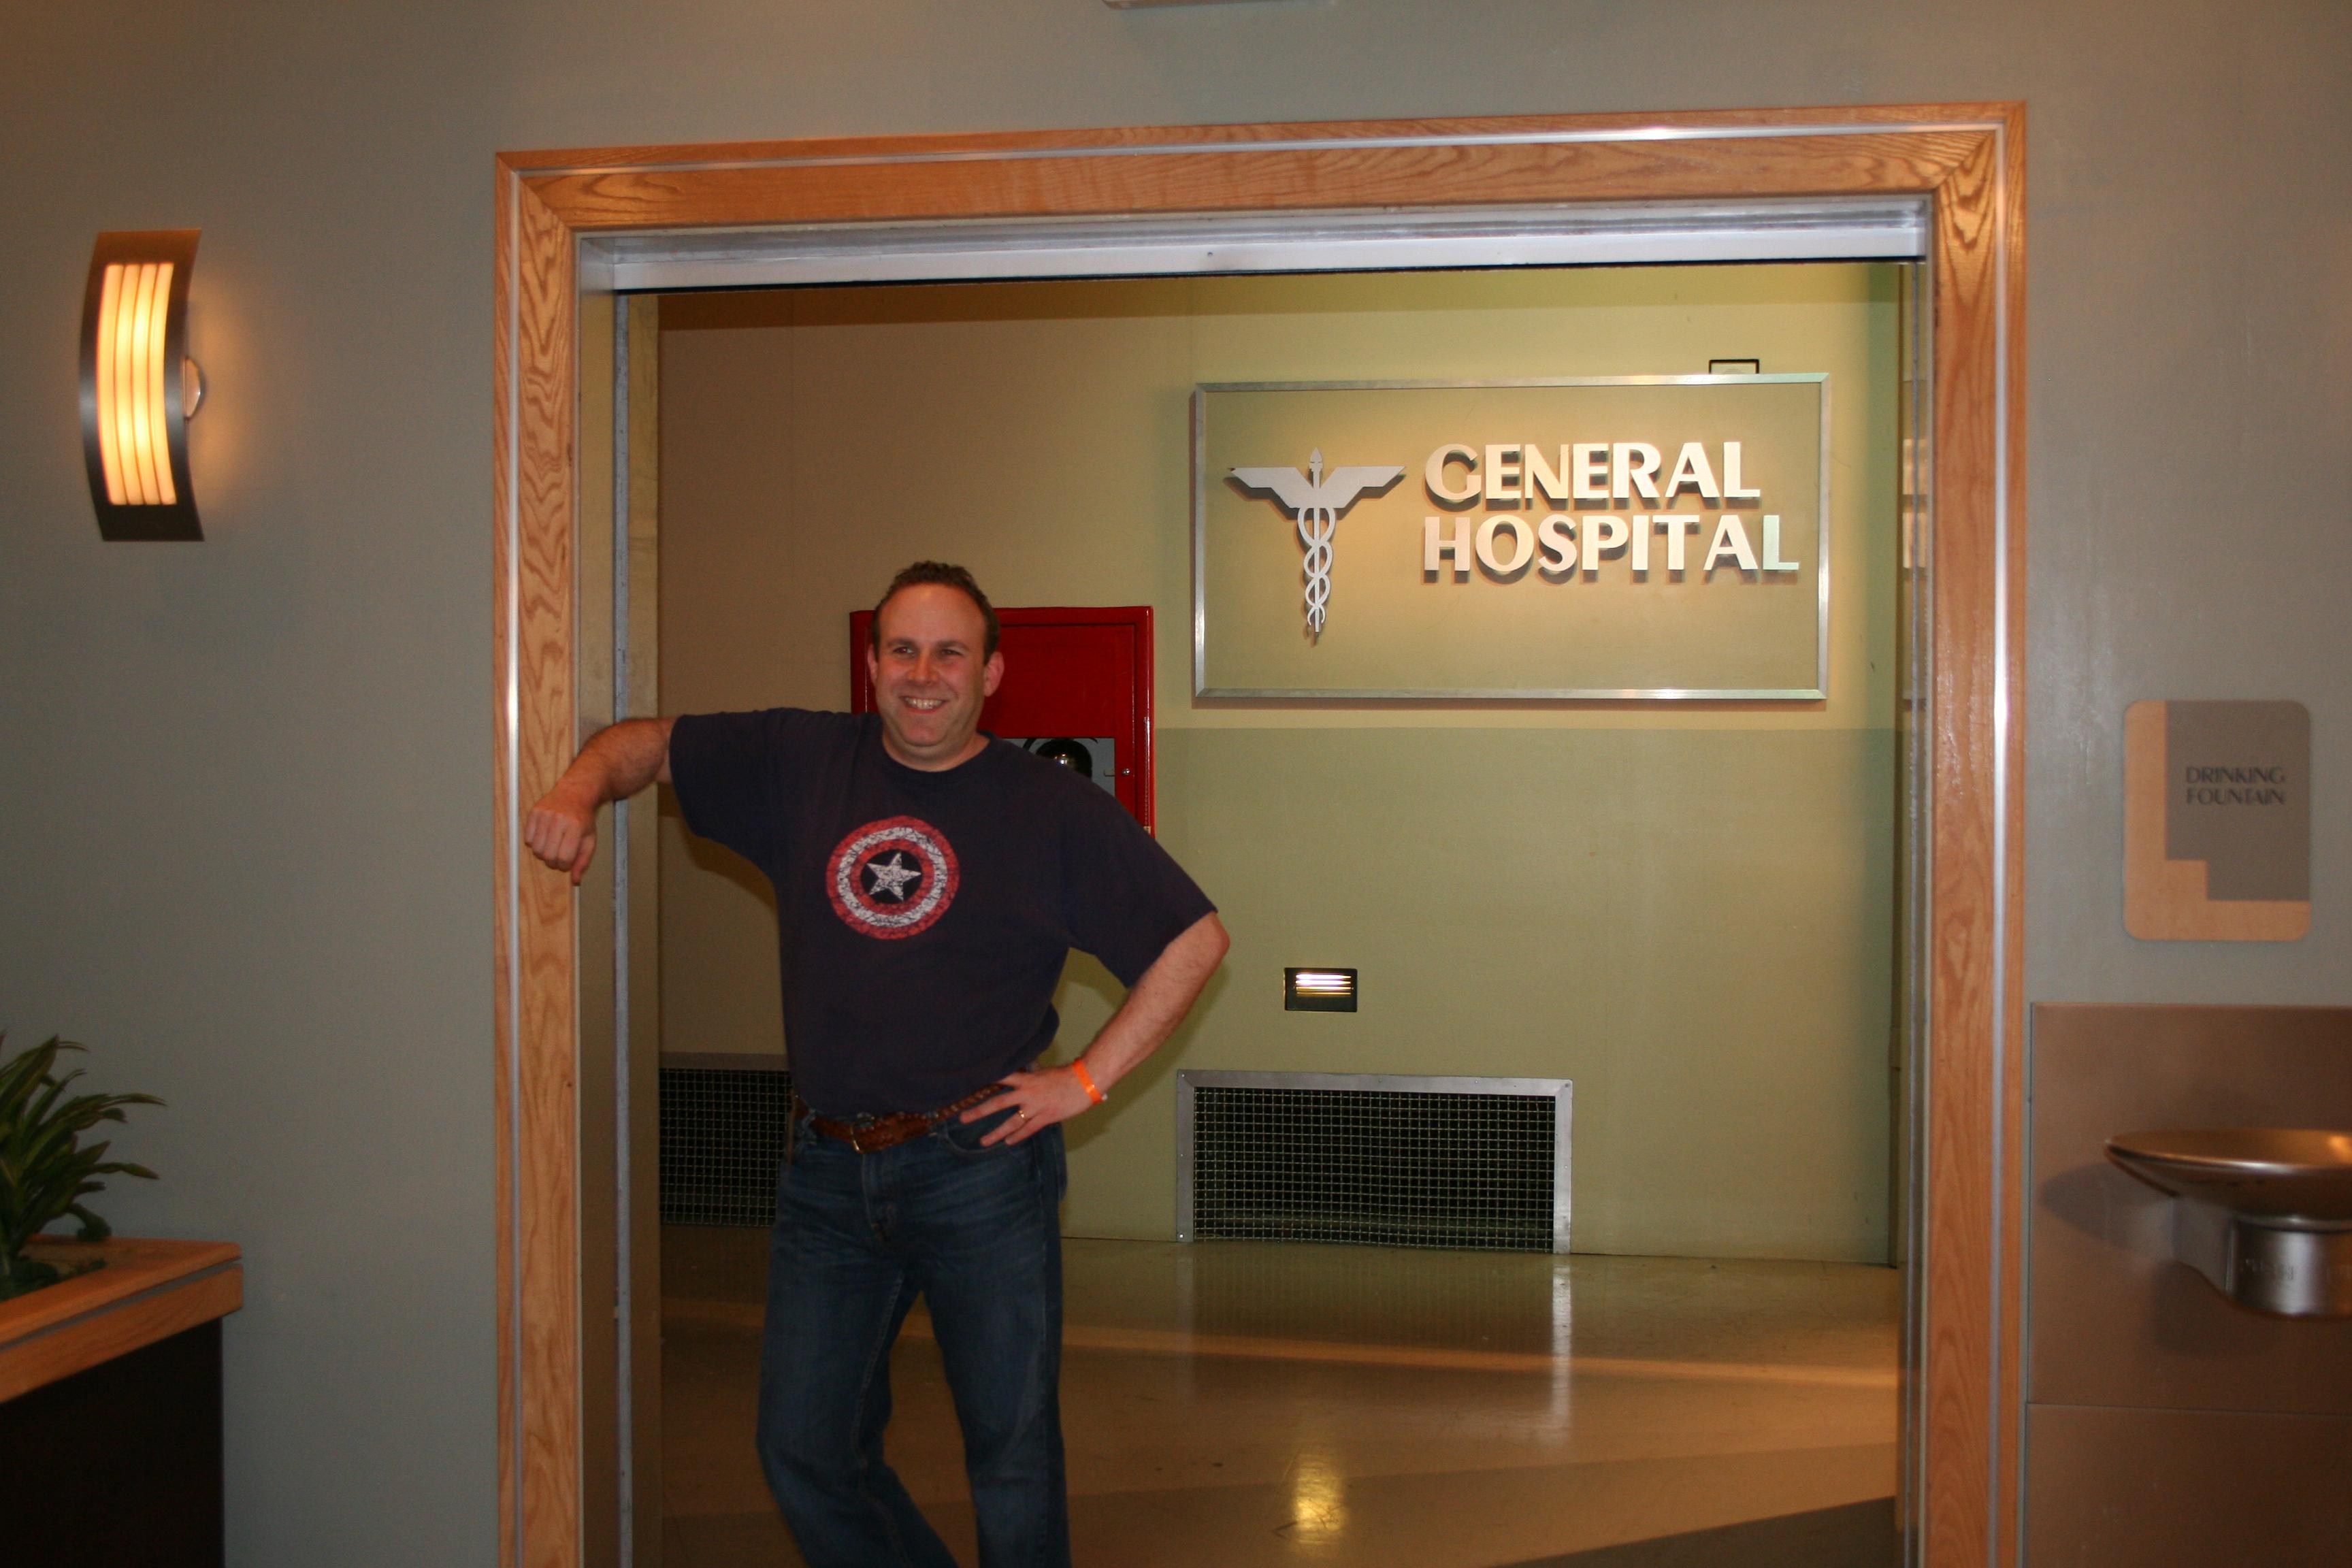 #GeneralHospital #ABCTVEvent